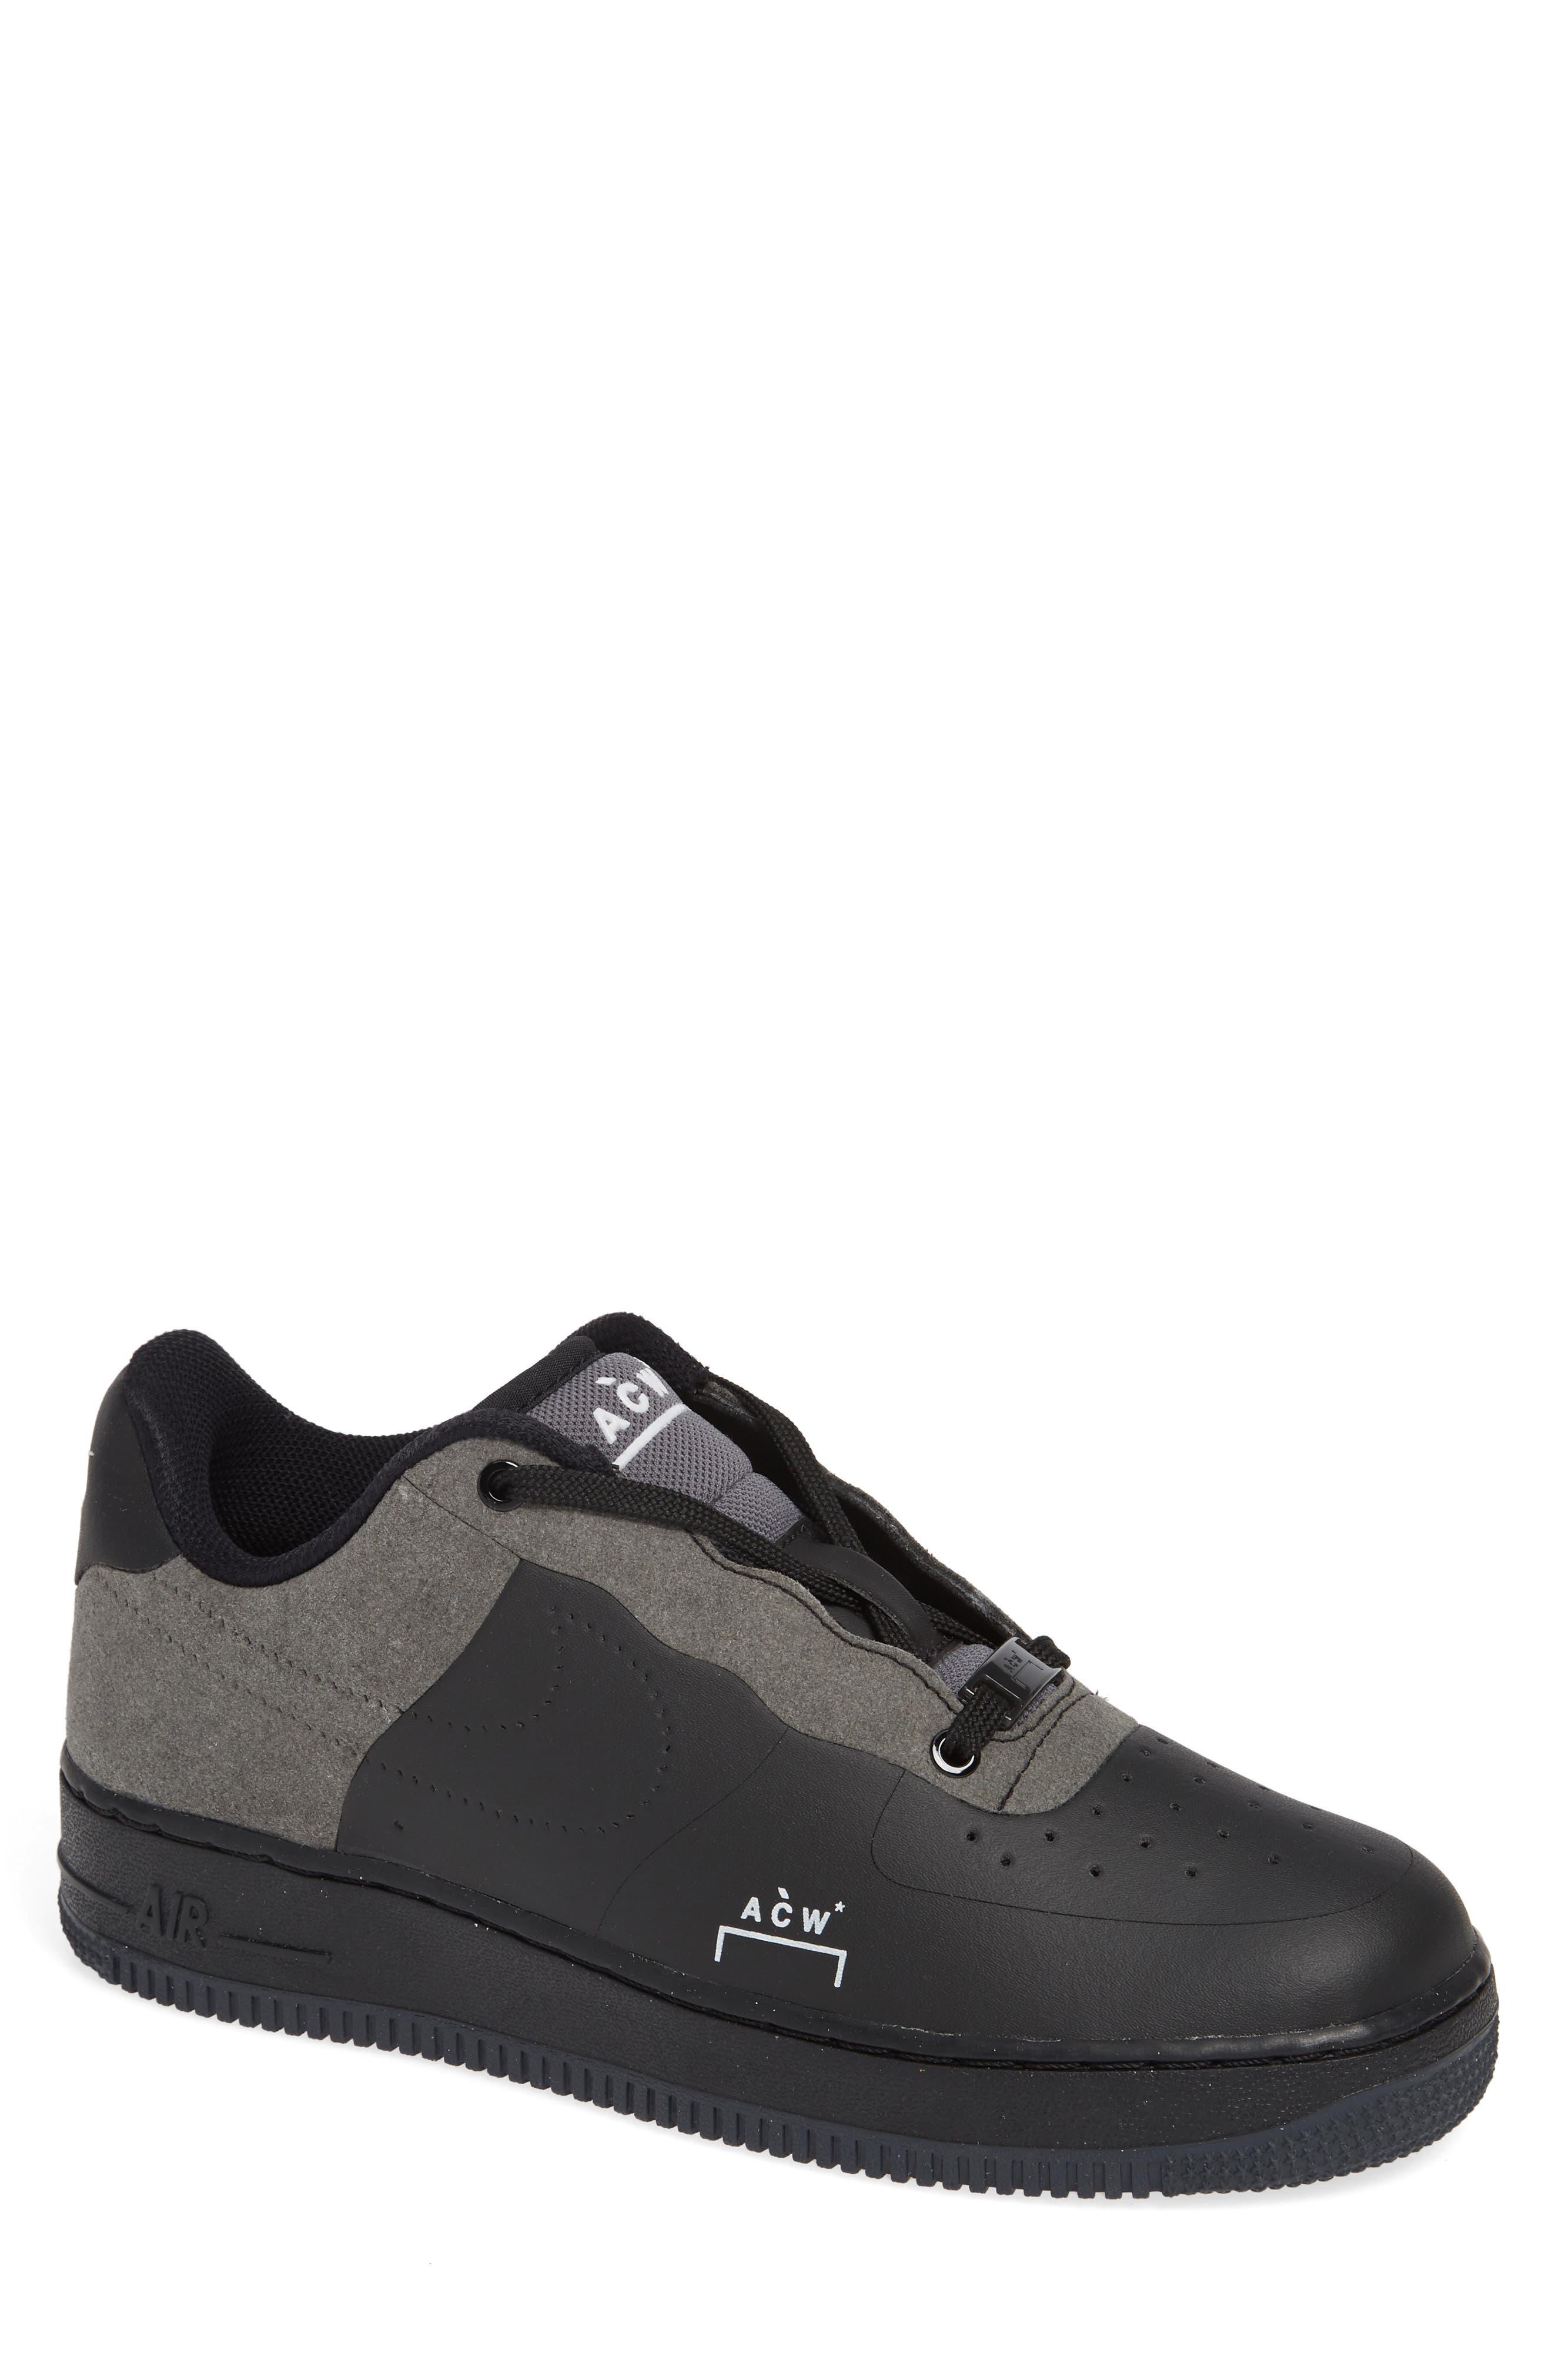 x A-COLD-WALL Air Force 1 '07 Sneaker,                             Main thumbnail 1, color,                             BLACK/ WHITE/ DARK GREY